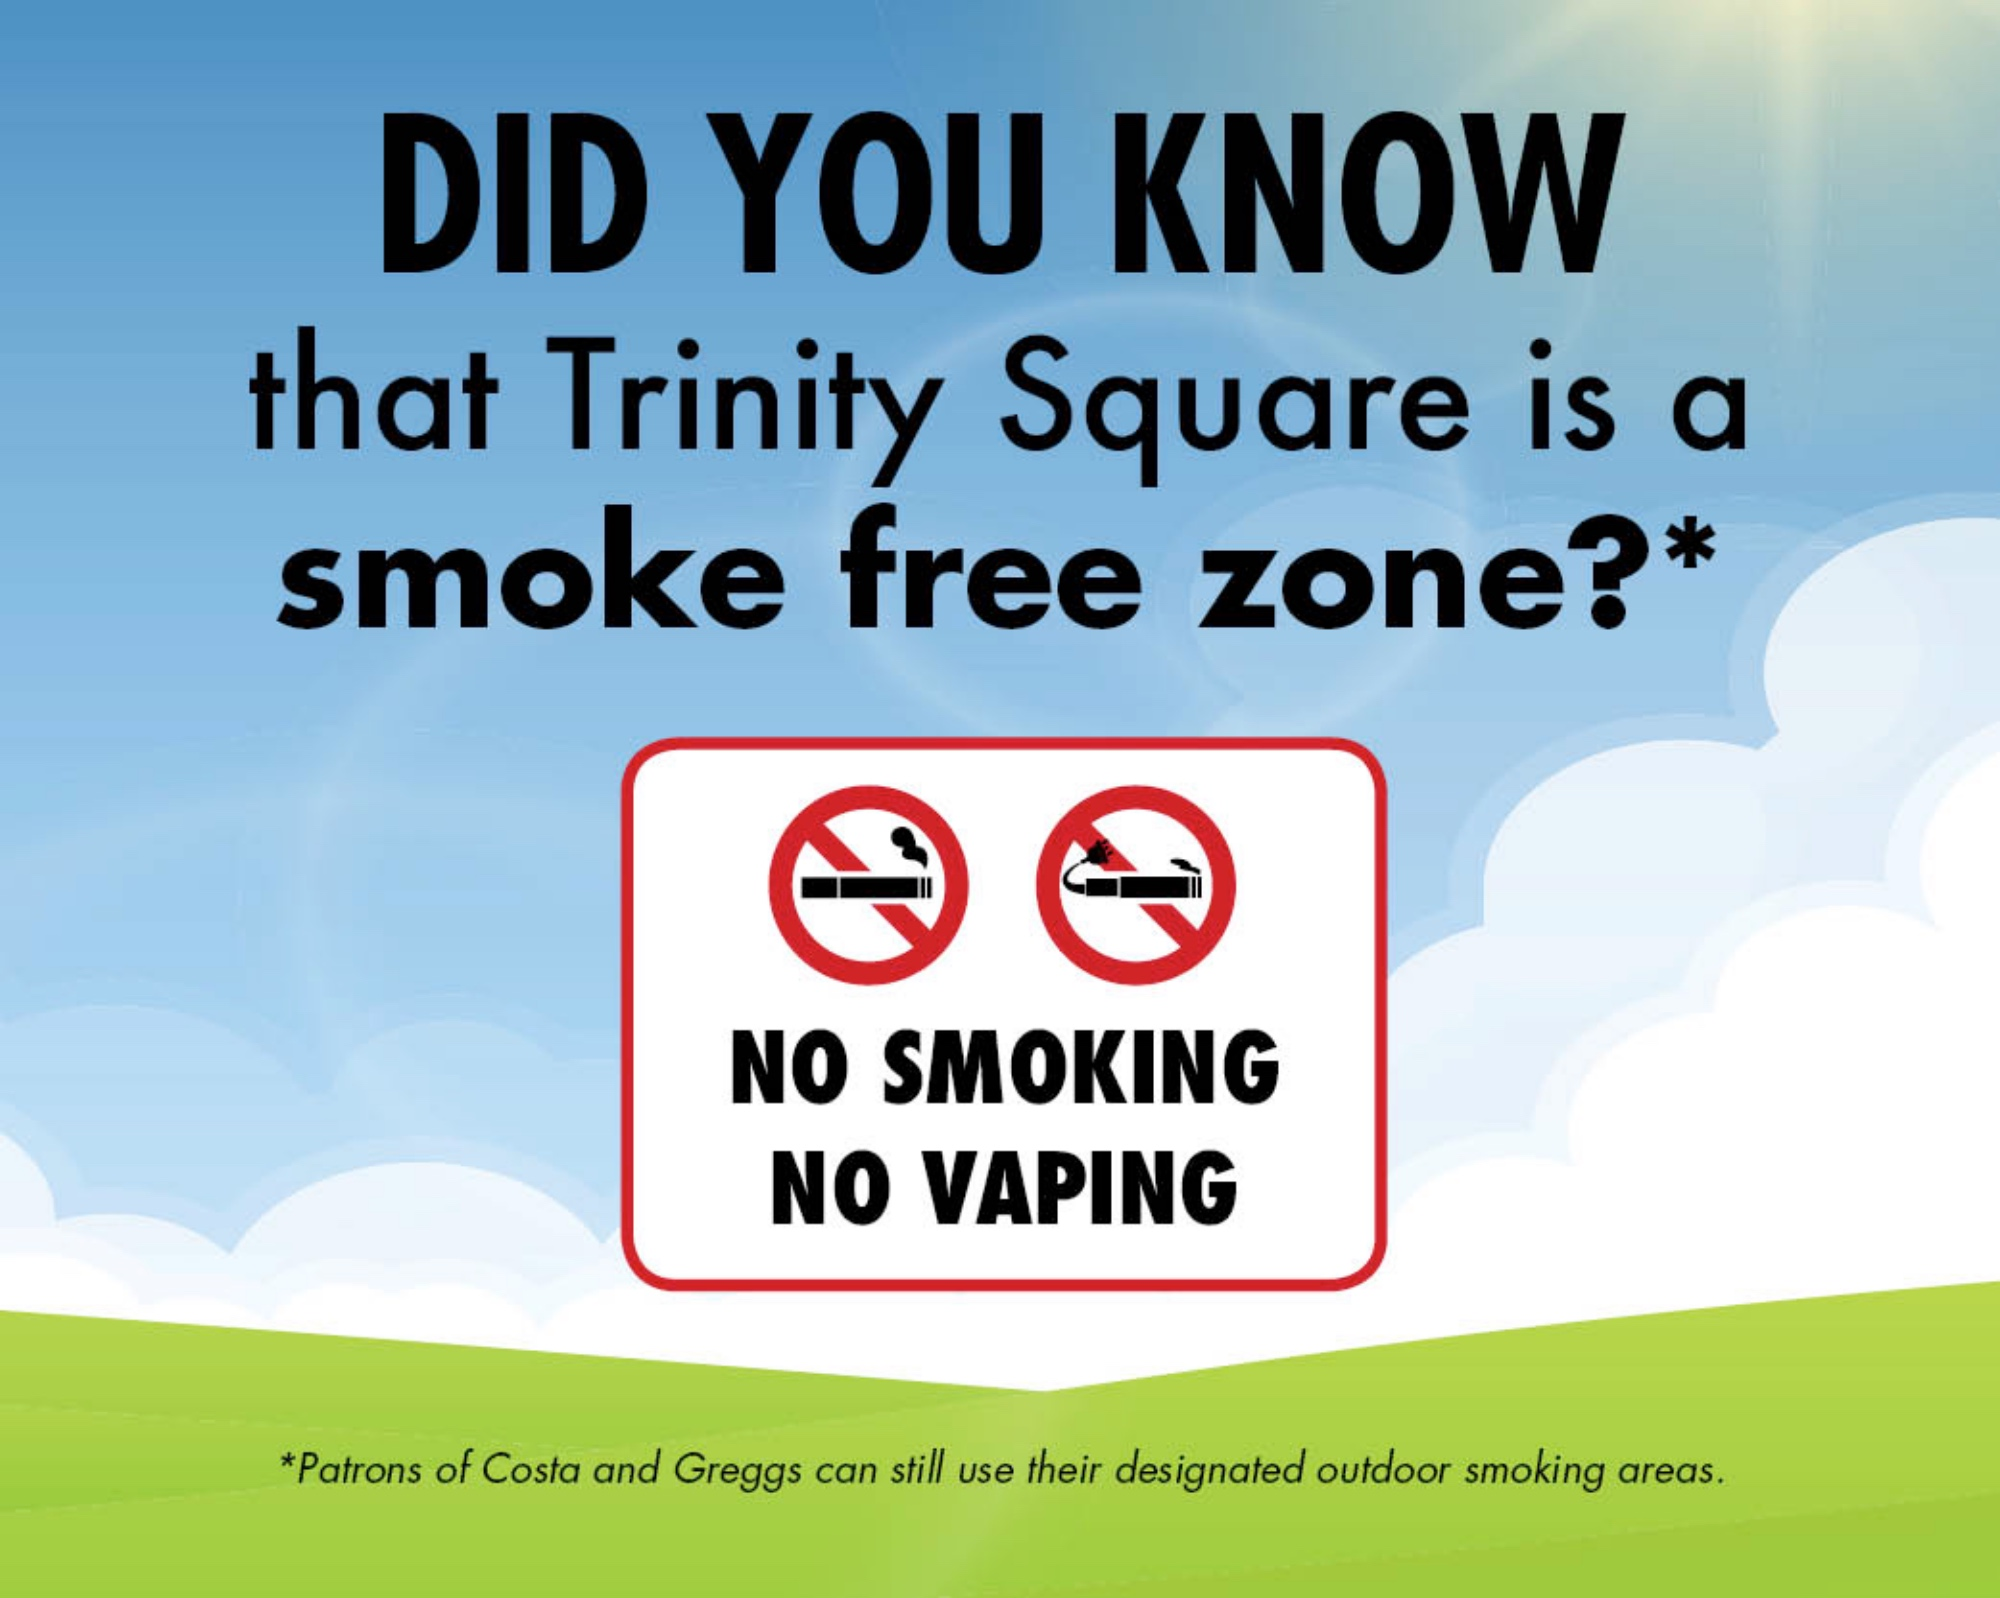 Trinity Square is a smoke free zone